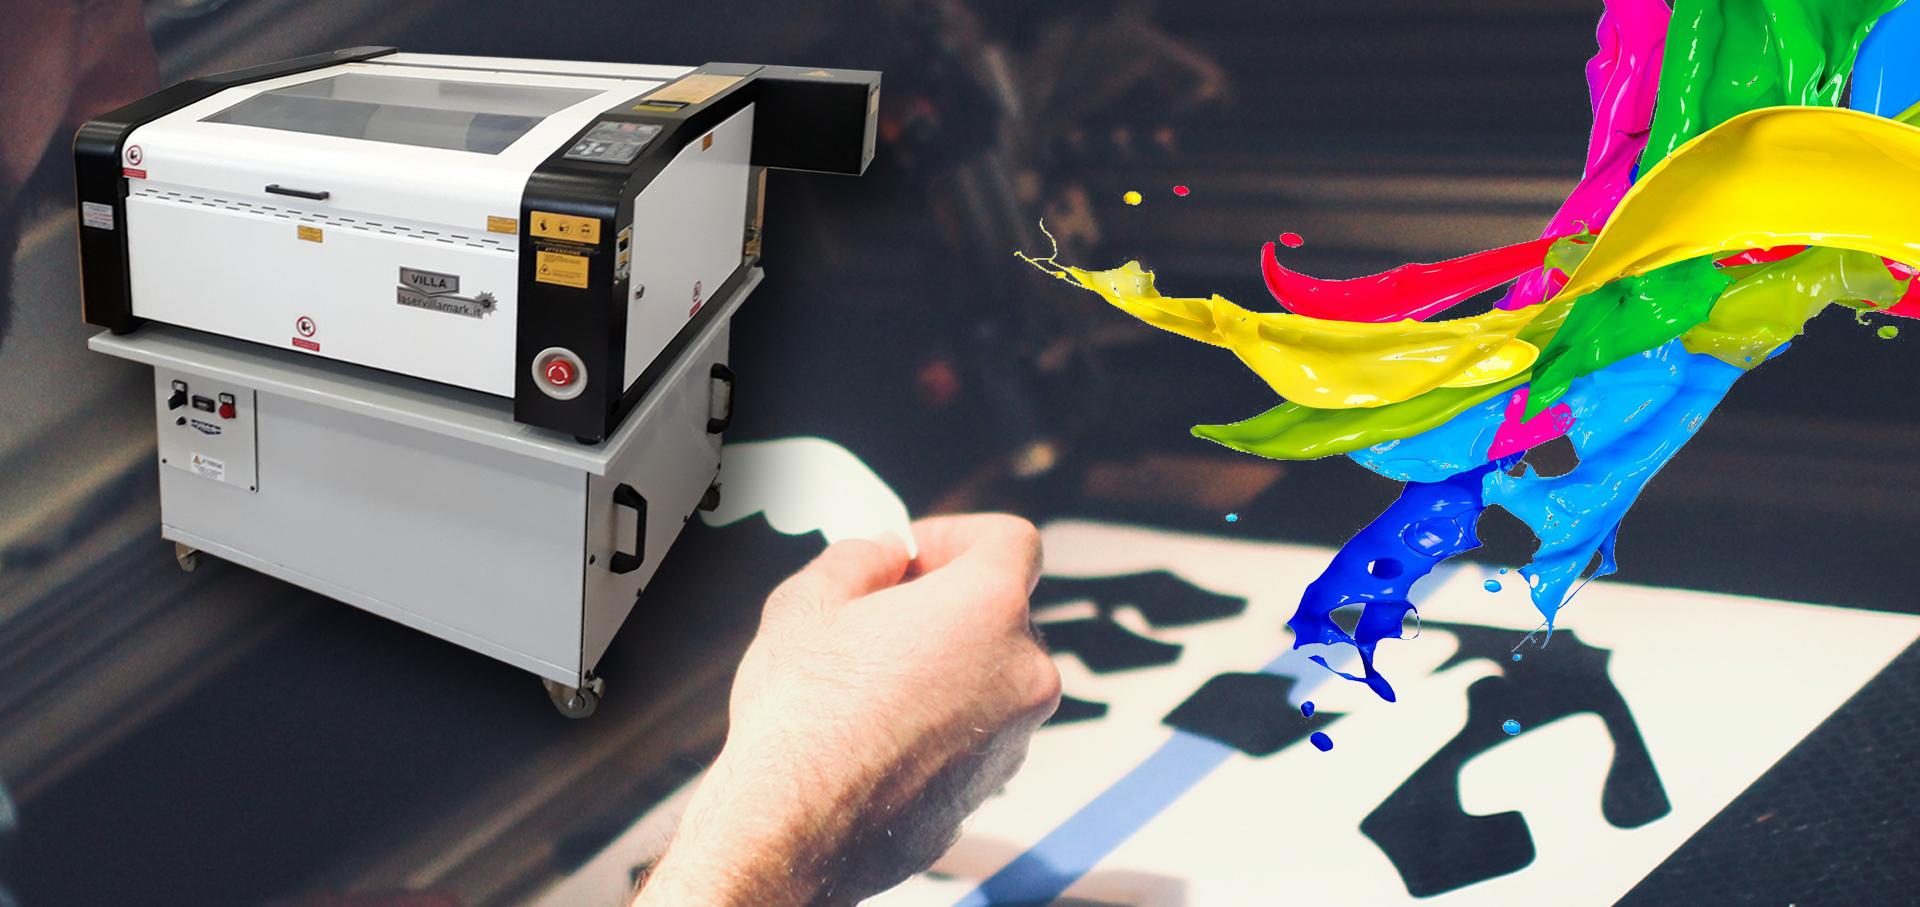 macchine laser per incisioni